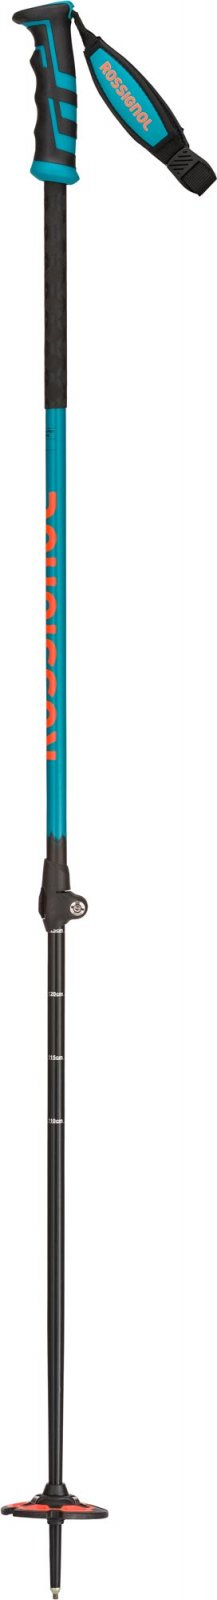 Rossignol Freeride Pro Telescopic Safety Ski Poles 2020